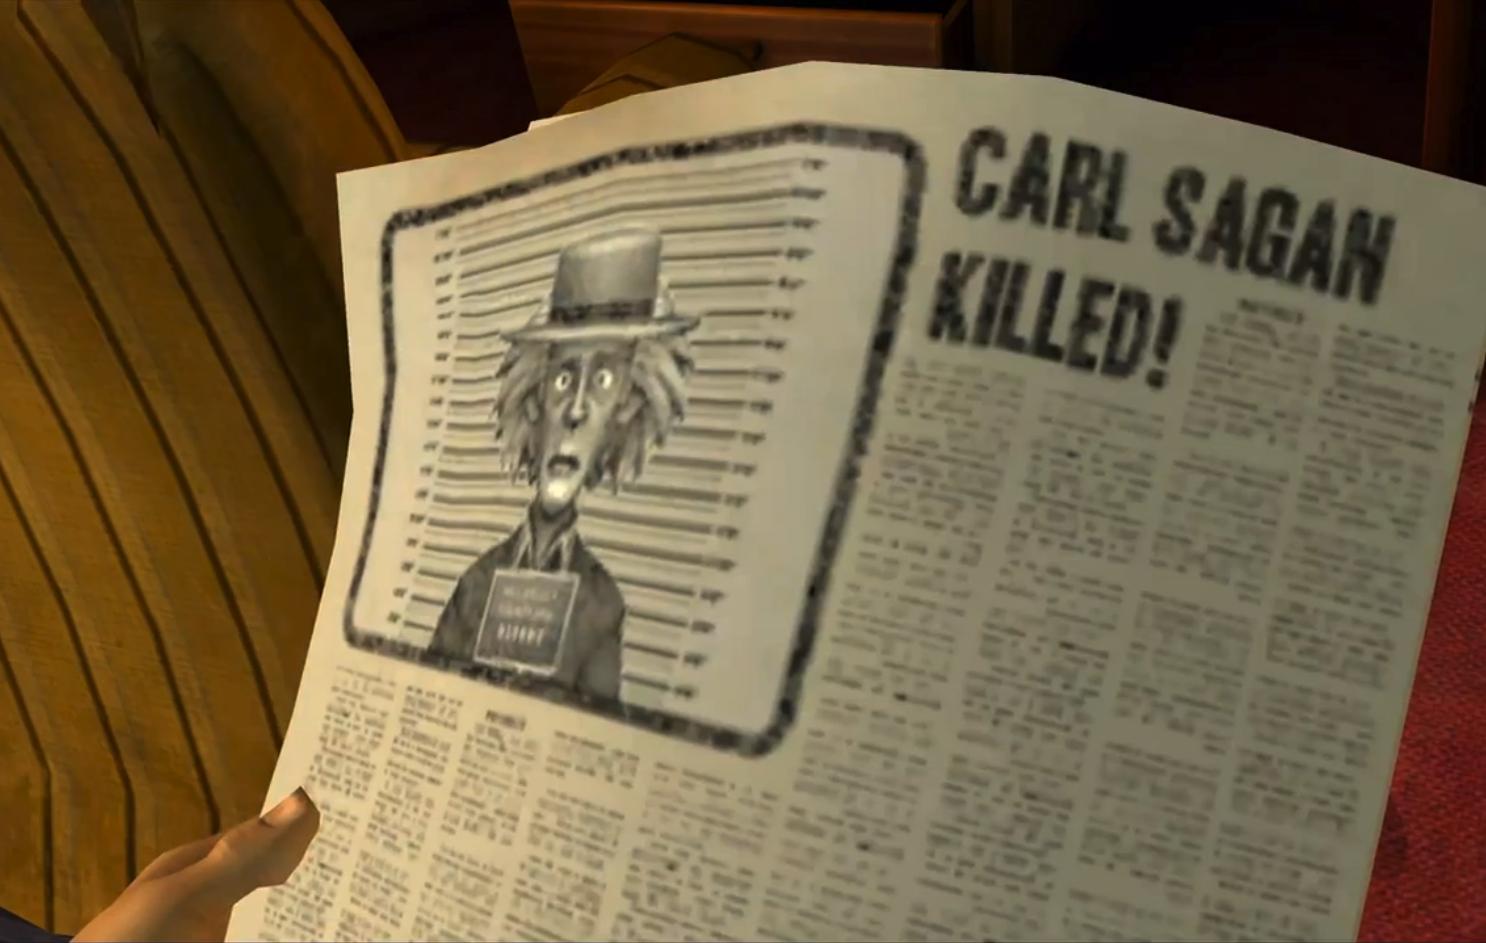 1931Newspaper-SaganKilled.png